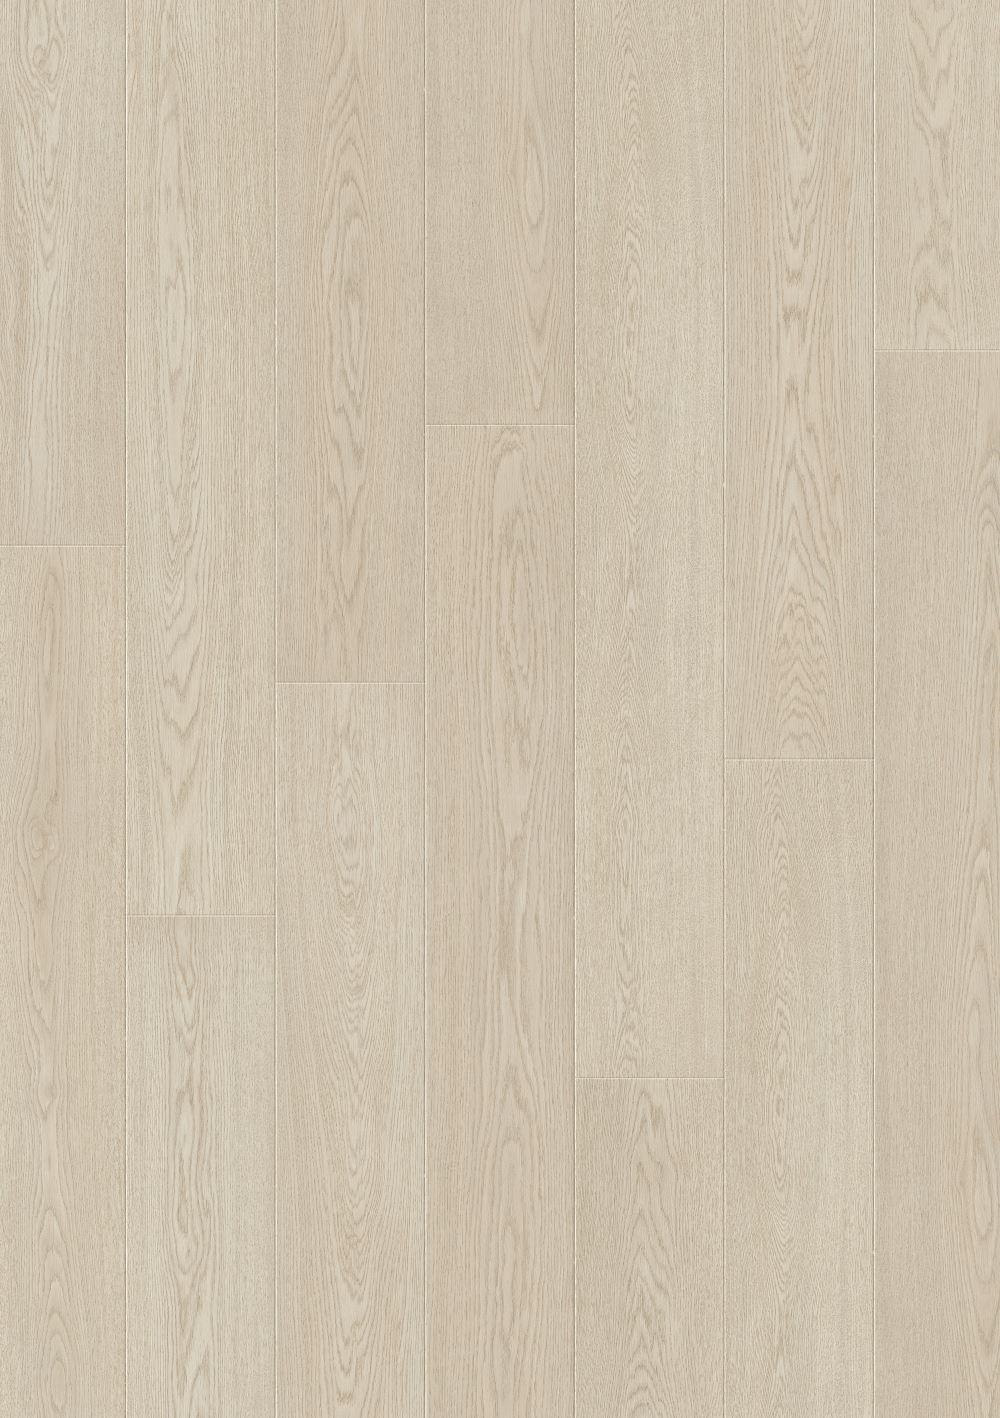 Balterio Traditions TRD61000 Diamond Oak